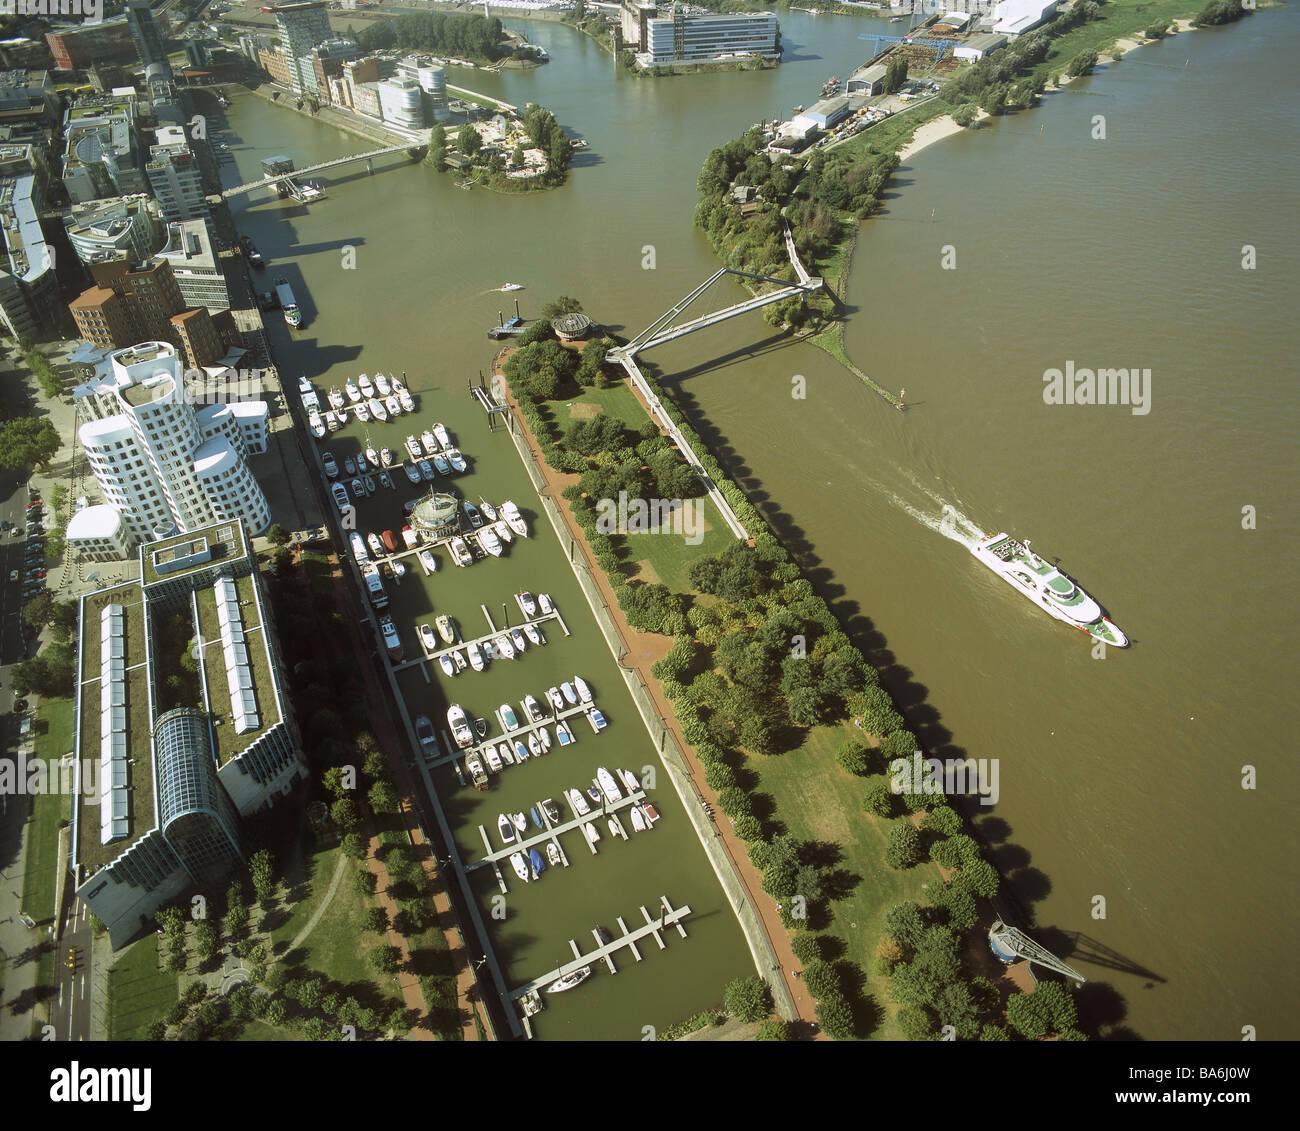 City Düsseldorf River Rhine Overview Stock Photos & City Düsseldorf ...